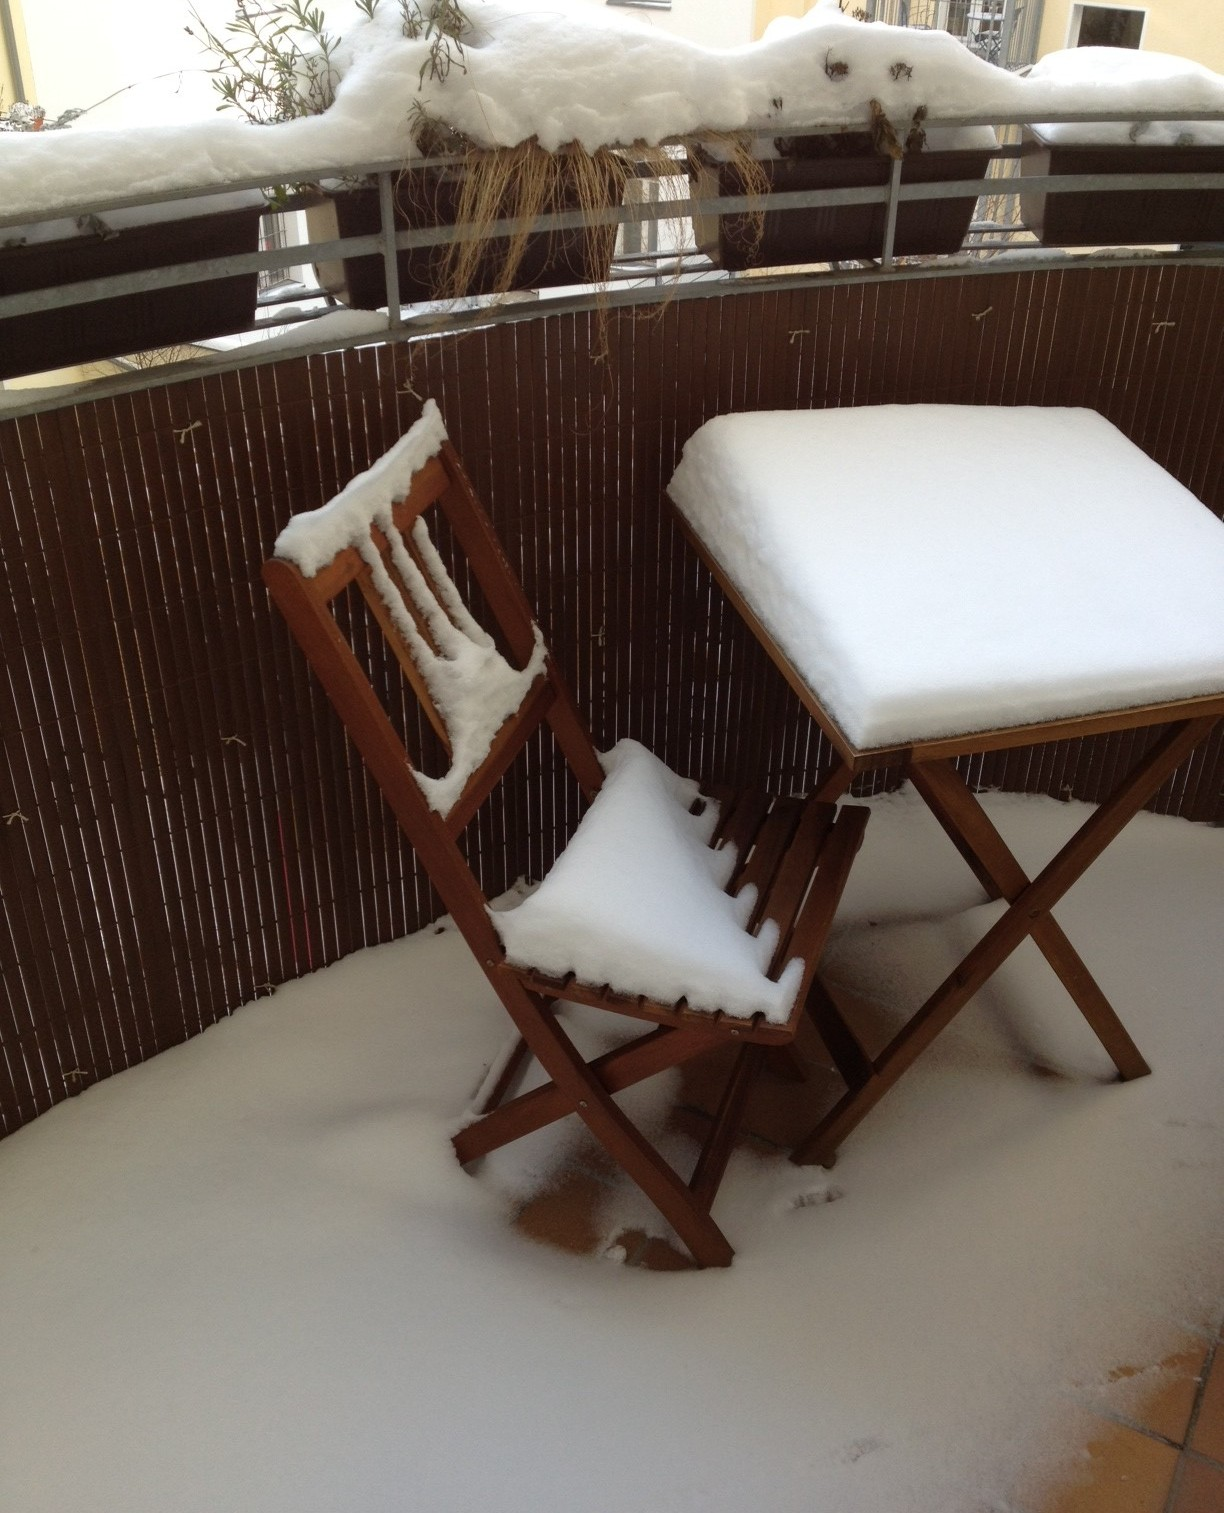 Snow in Berlin - Savannah Page, author